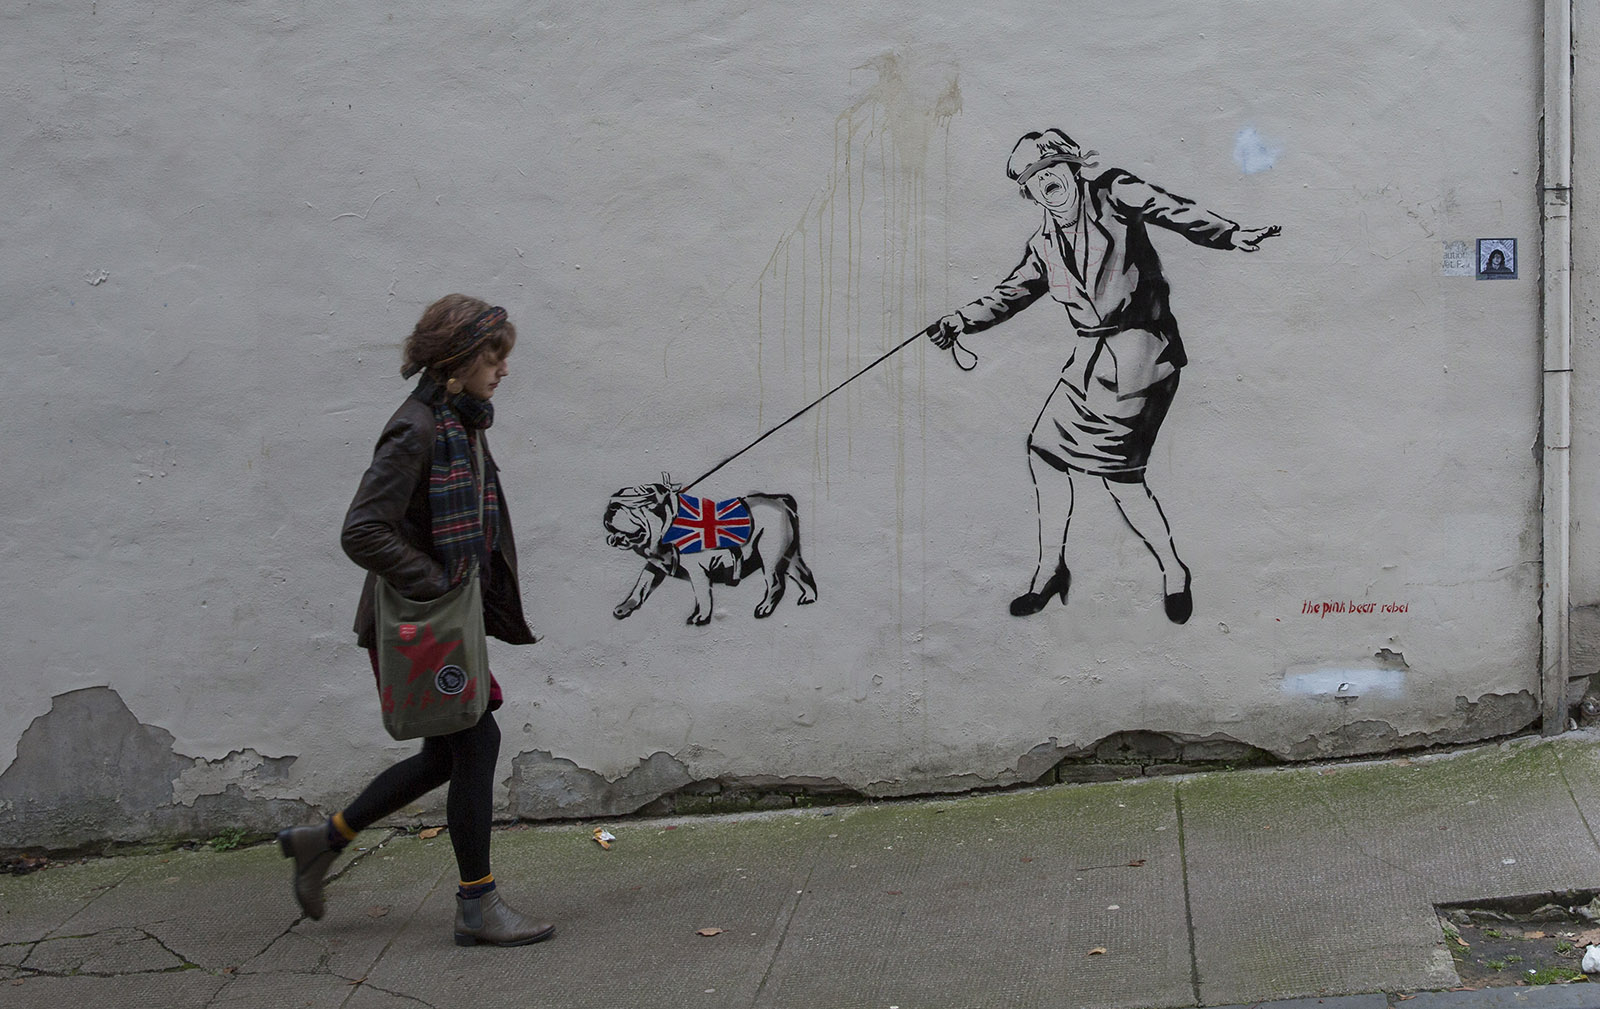 Street art showing Prime Minister Theresa May led by a British bulldog, Glasgow, Scotland, November 2018